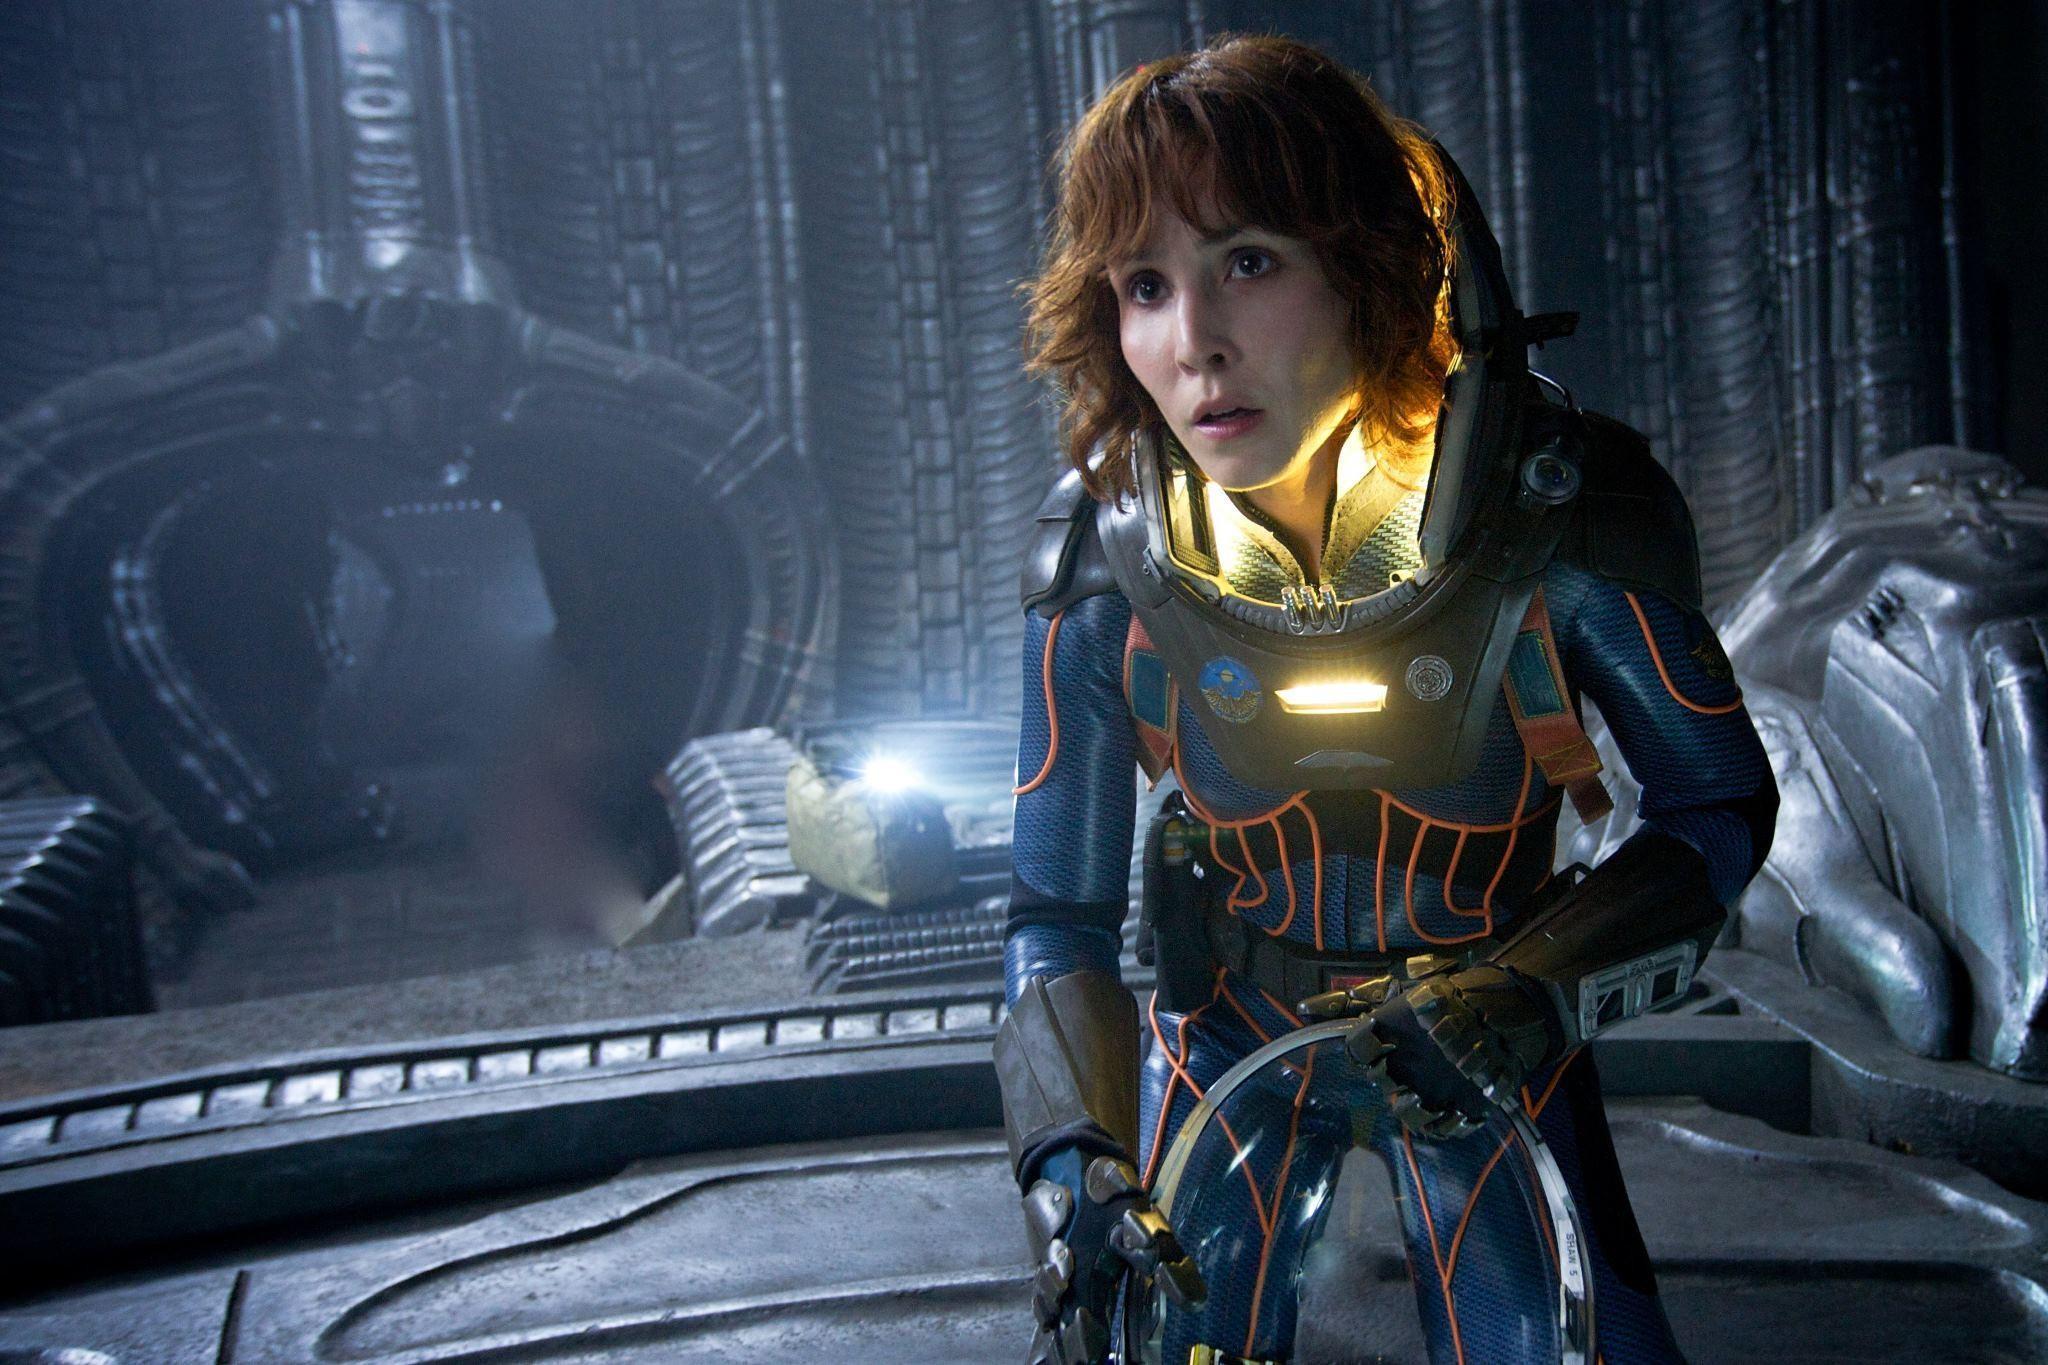 Alien Covenant Prometheus Actor Noomi Rapace To Return